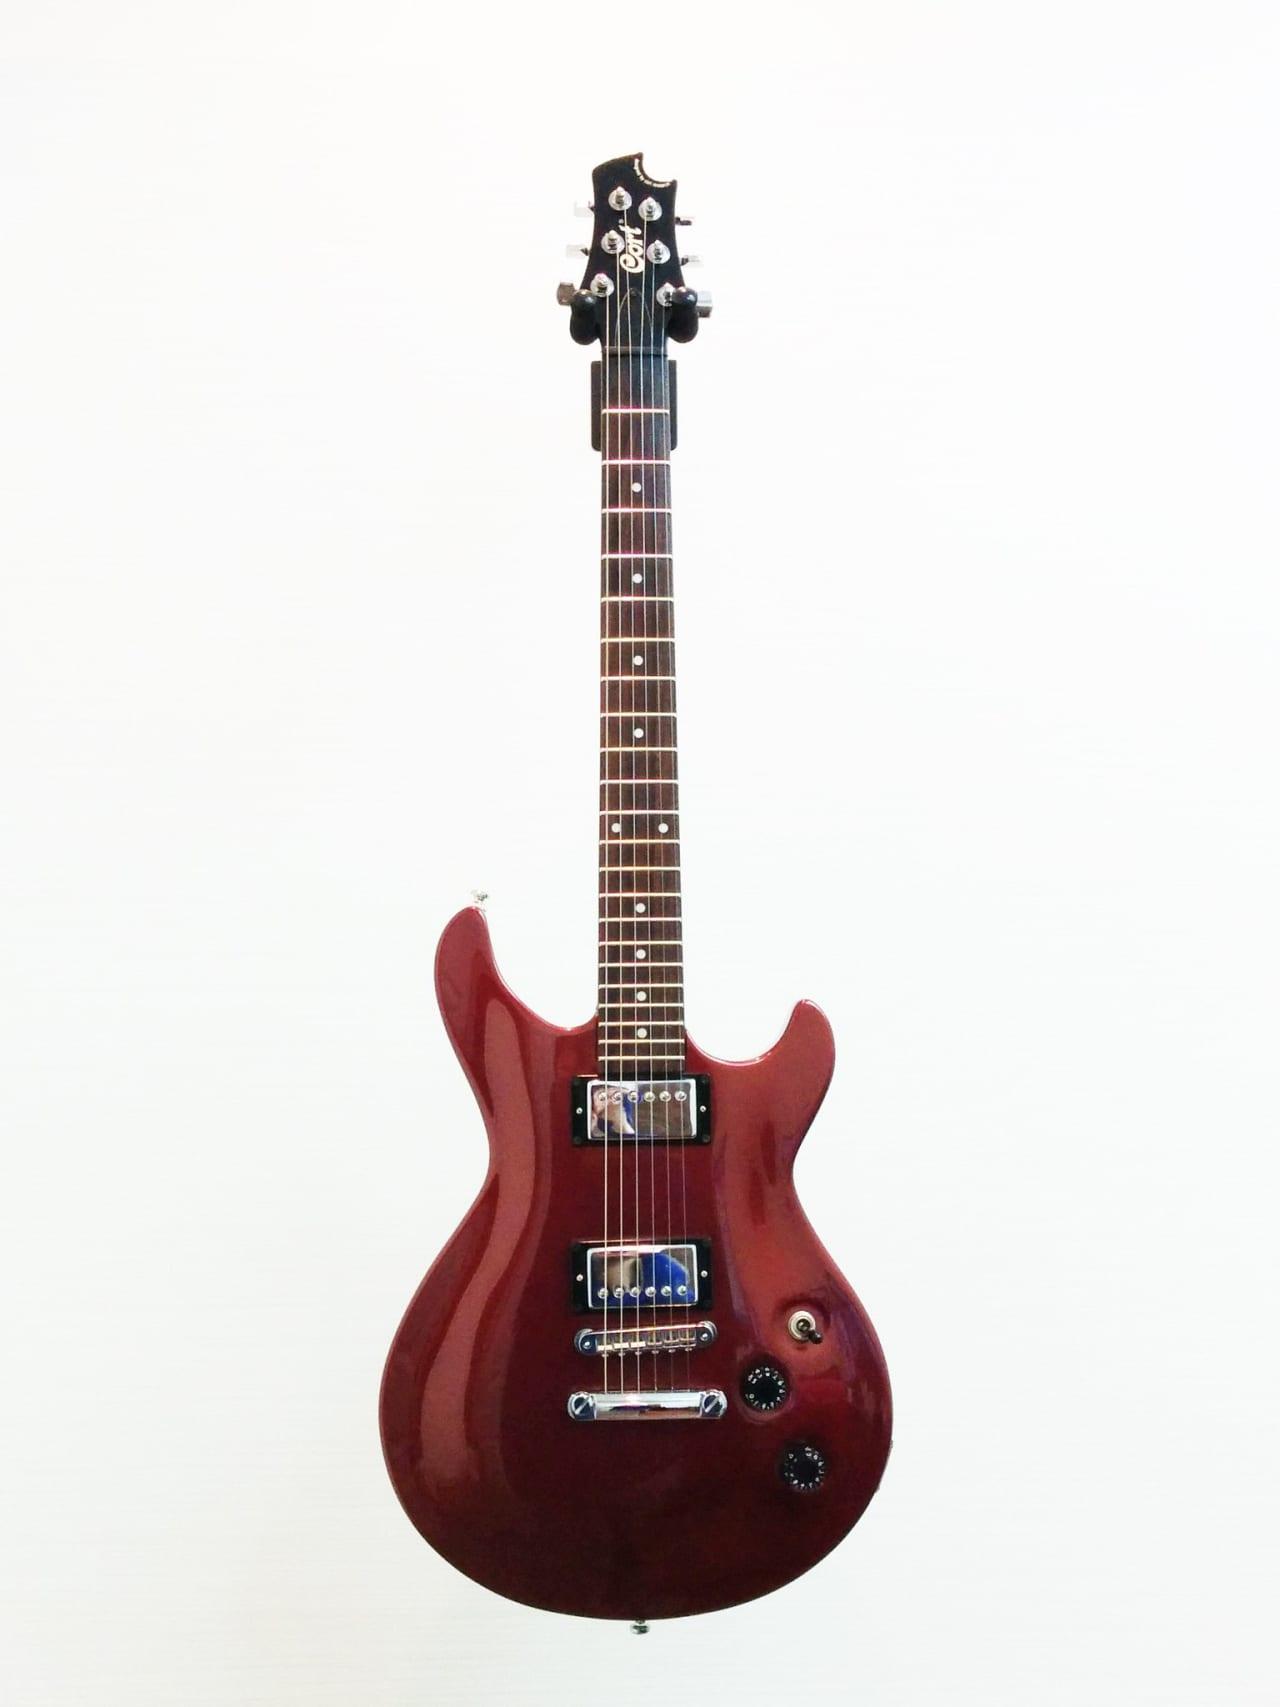 Cort M500 Electric Guitar (EXC.+) | THE GUITAR HUB | Reverb